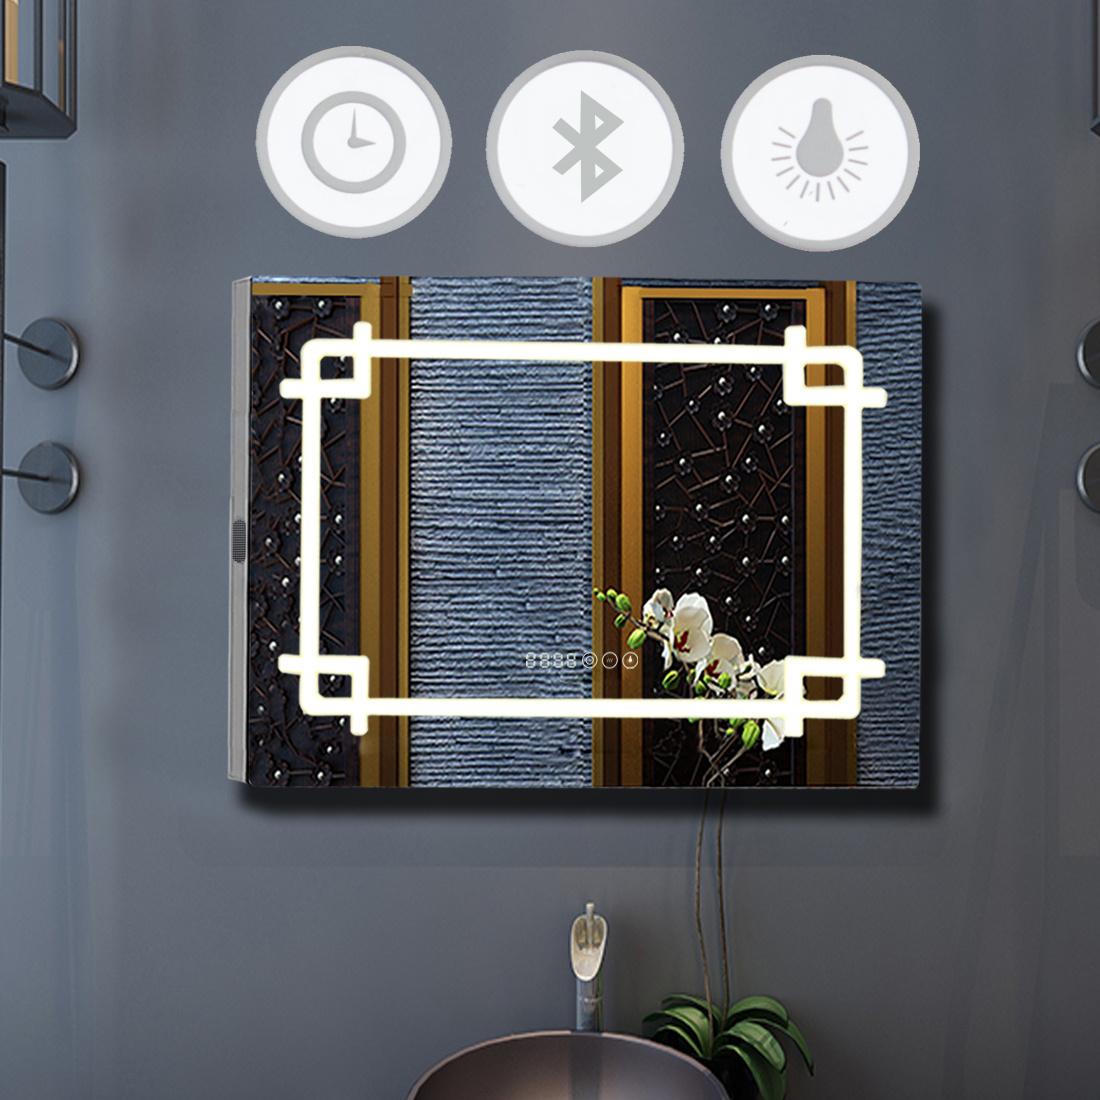 Illuminated Led Bathroom Mirror Bluetooth Speaker Sensor Shaver Clock Demister Ebay